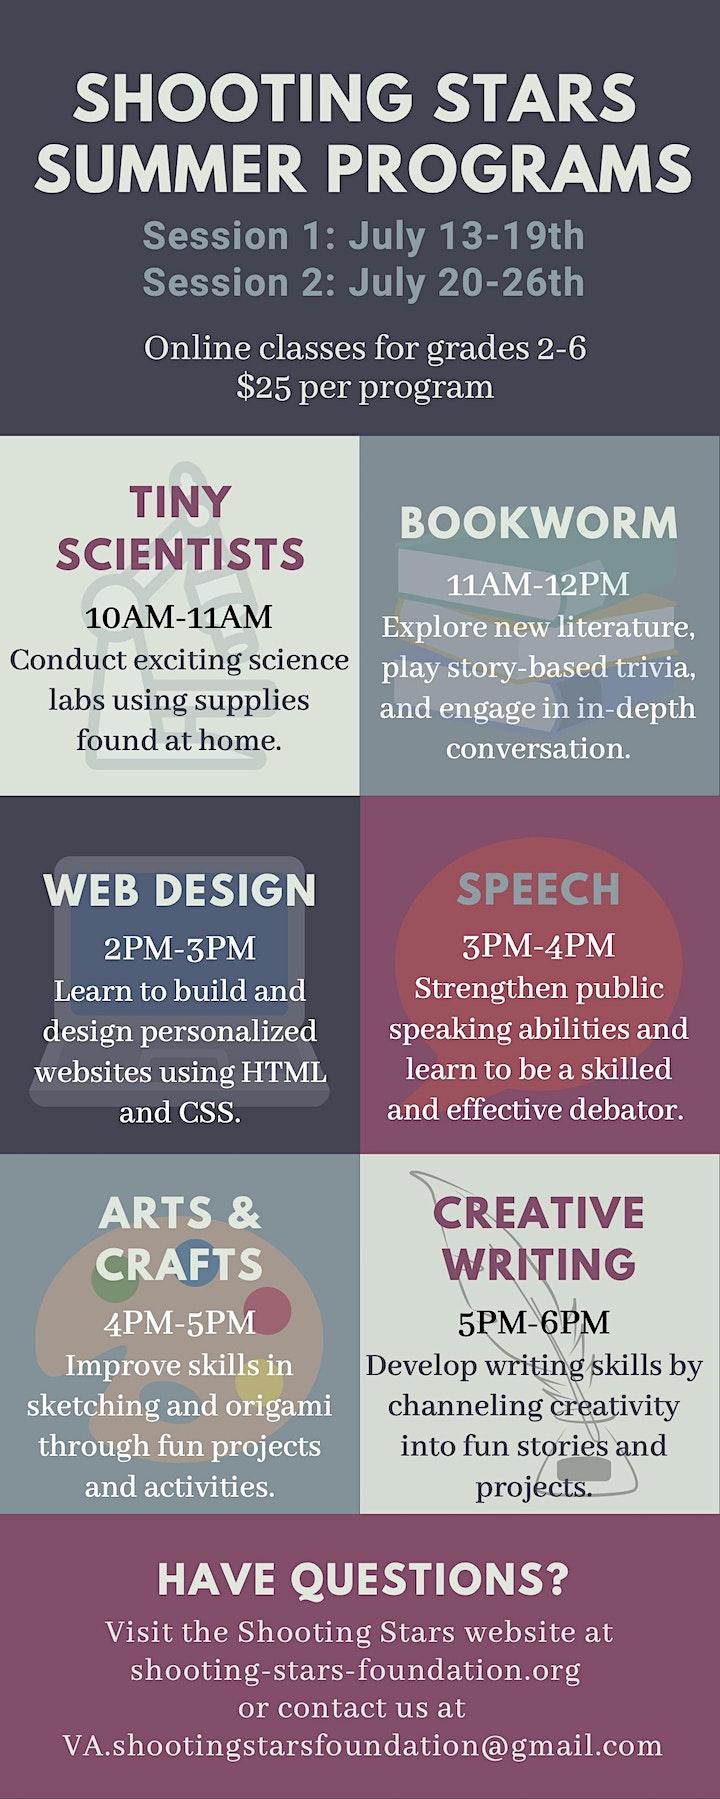 Online Web Design Session B July 20th - July 26th image